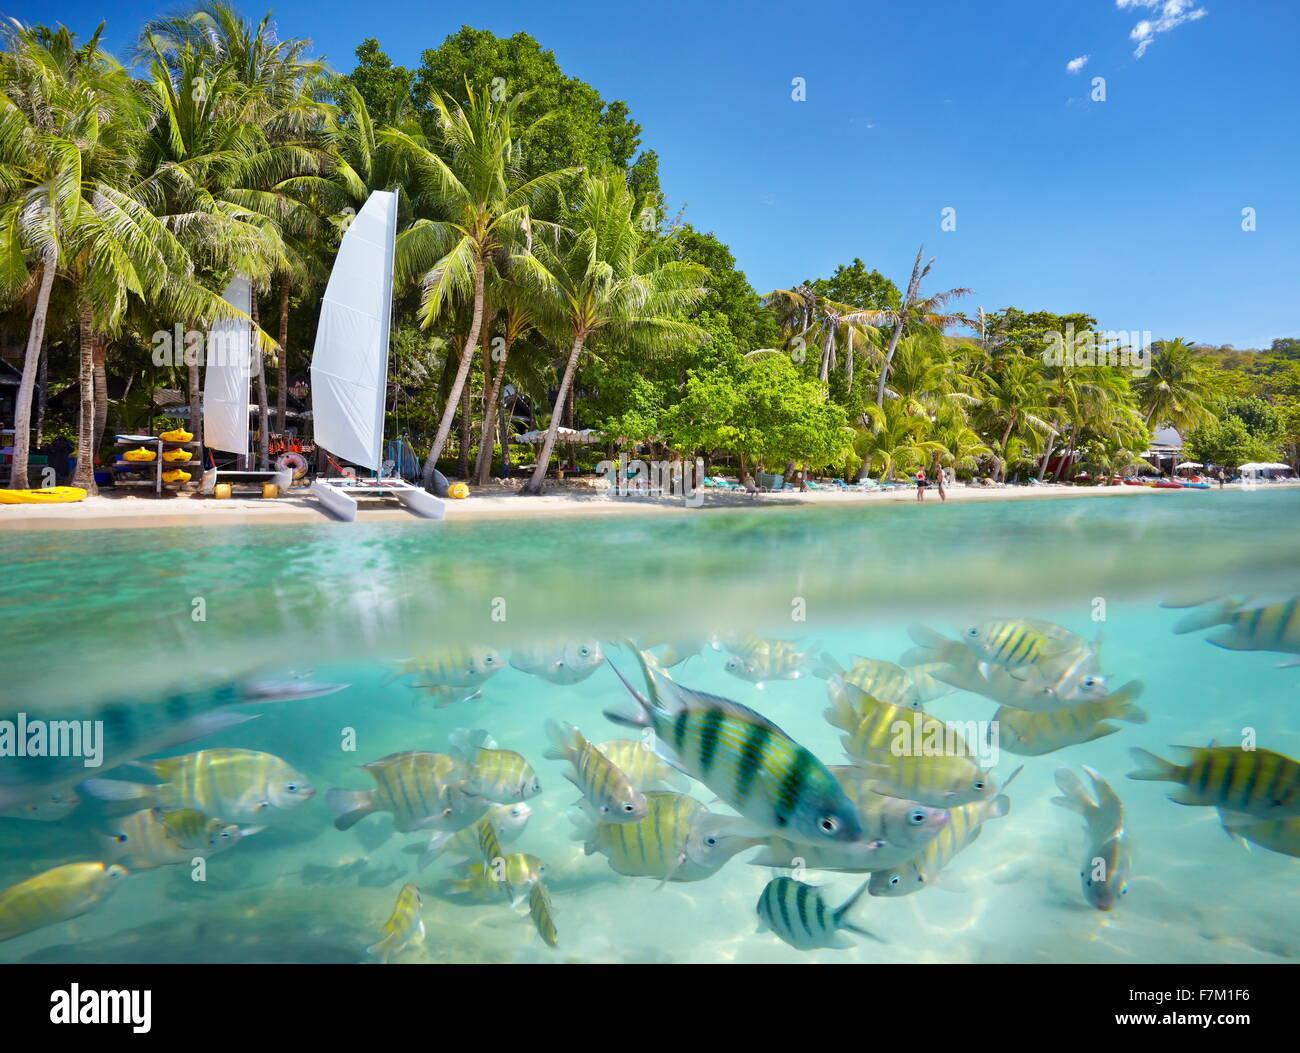 Hd Wallpaper Pack Thailand Beach Tropical Scenery At Ko Samet Island